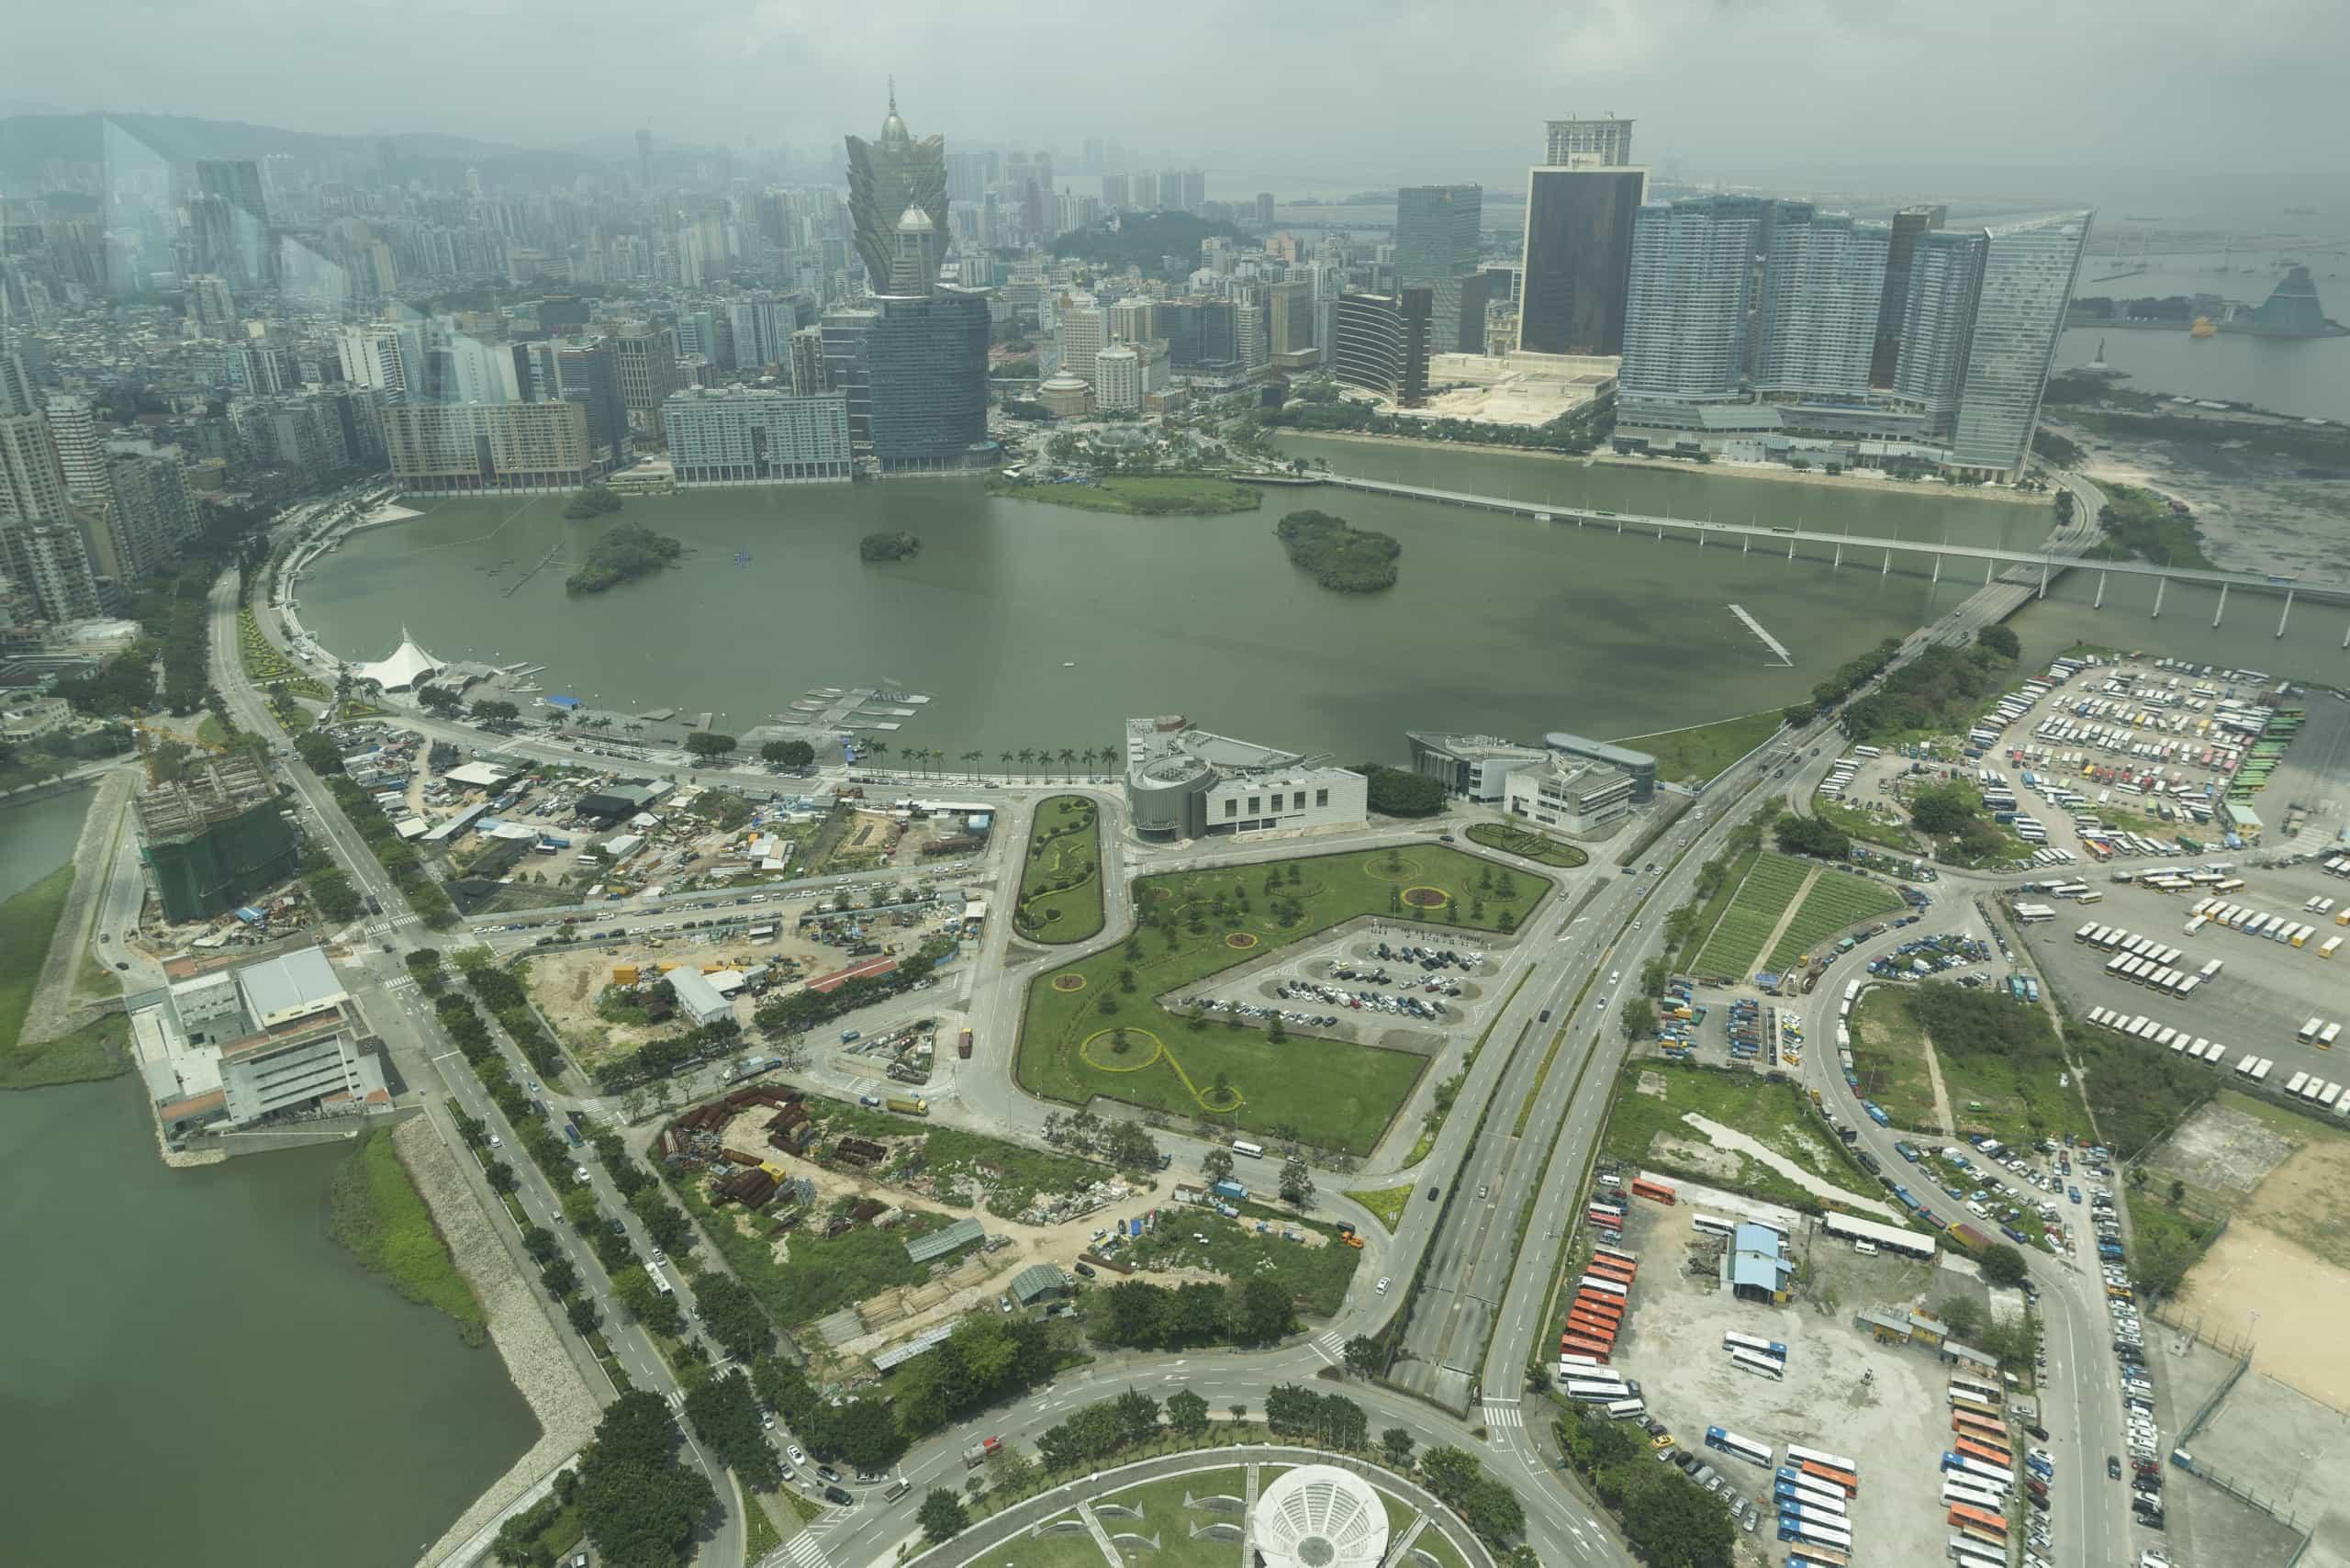 Macau junta peritos para debater Internet e 'cidade inteligente'